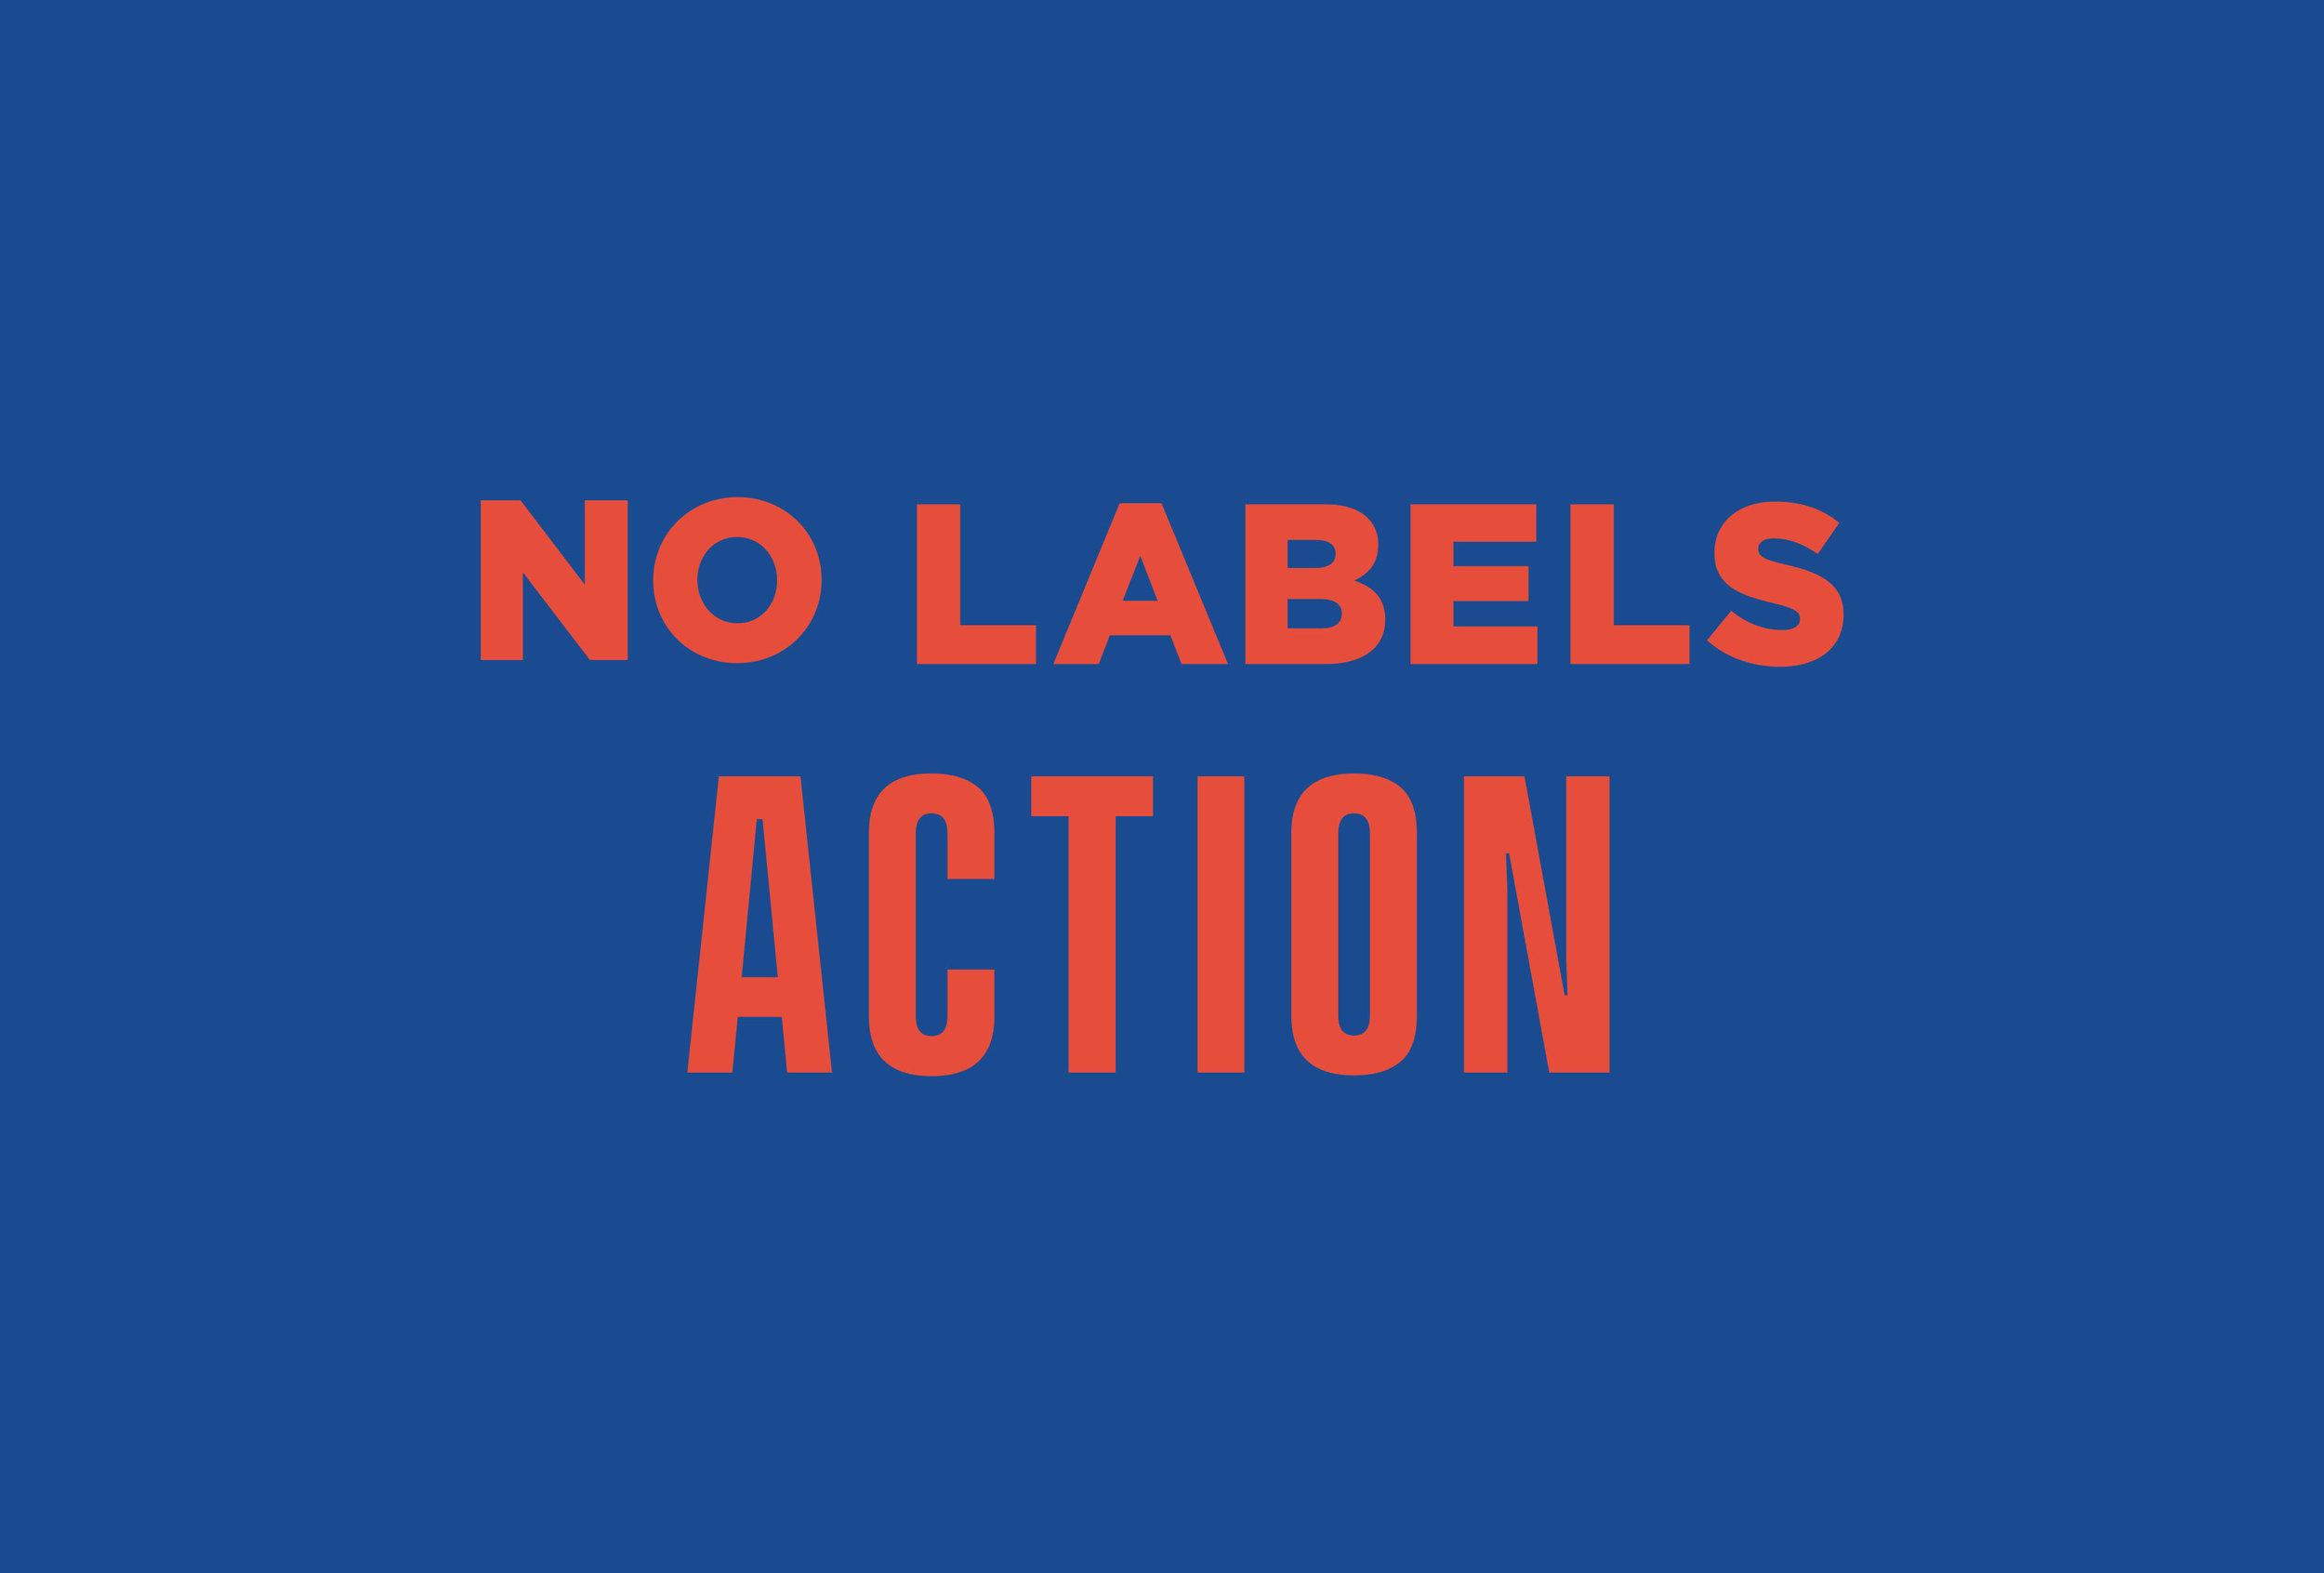 James-Rivas_No-Labels-Action_7.jpg